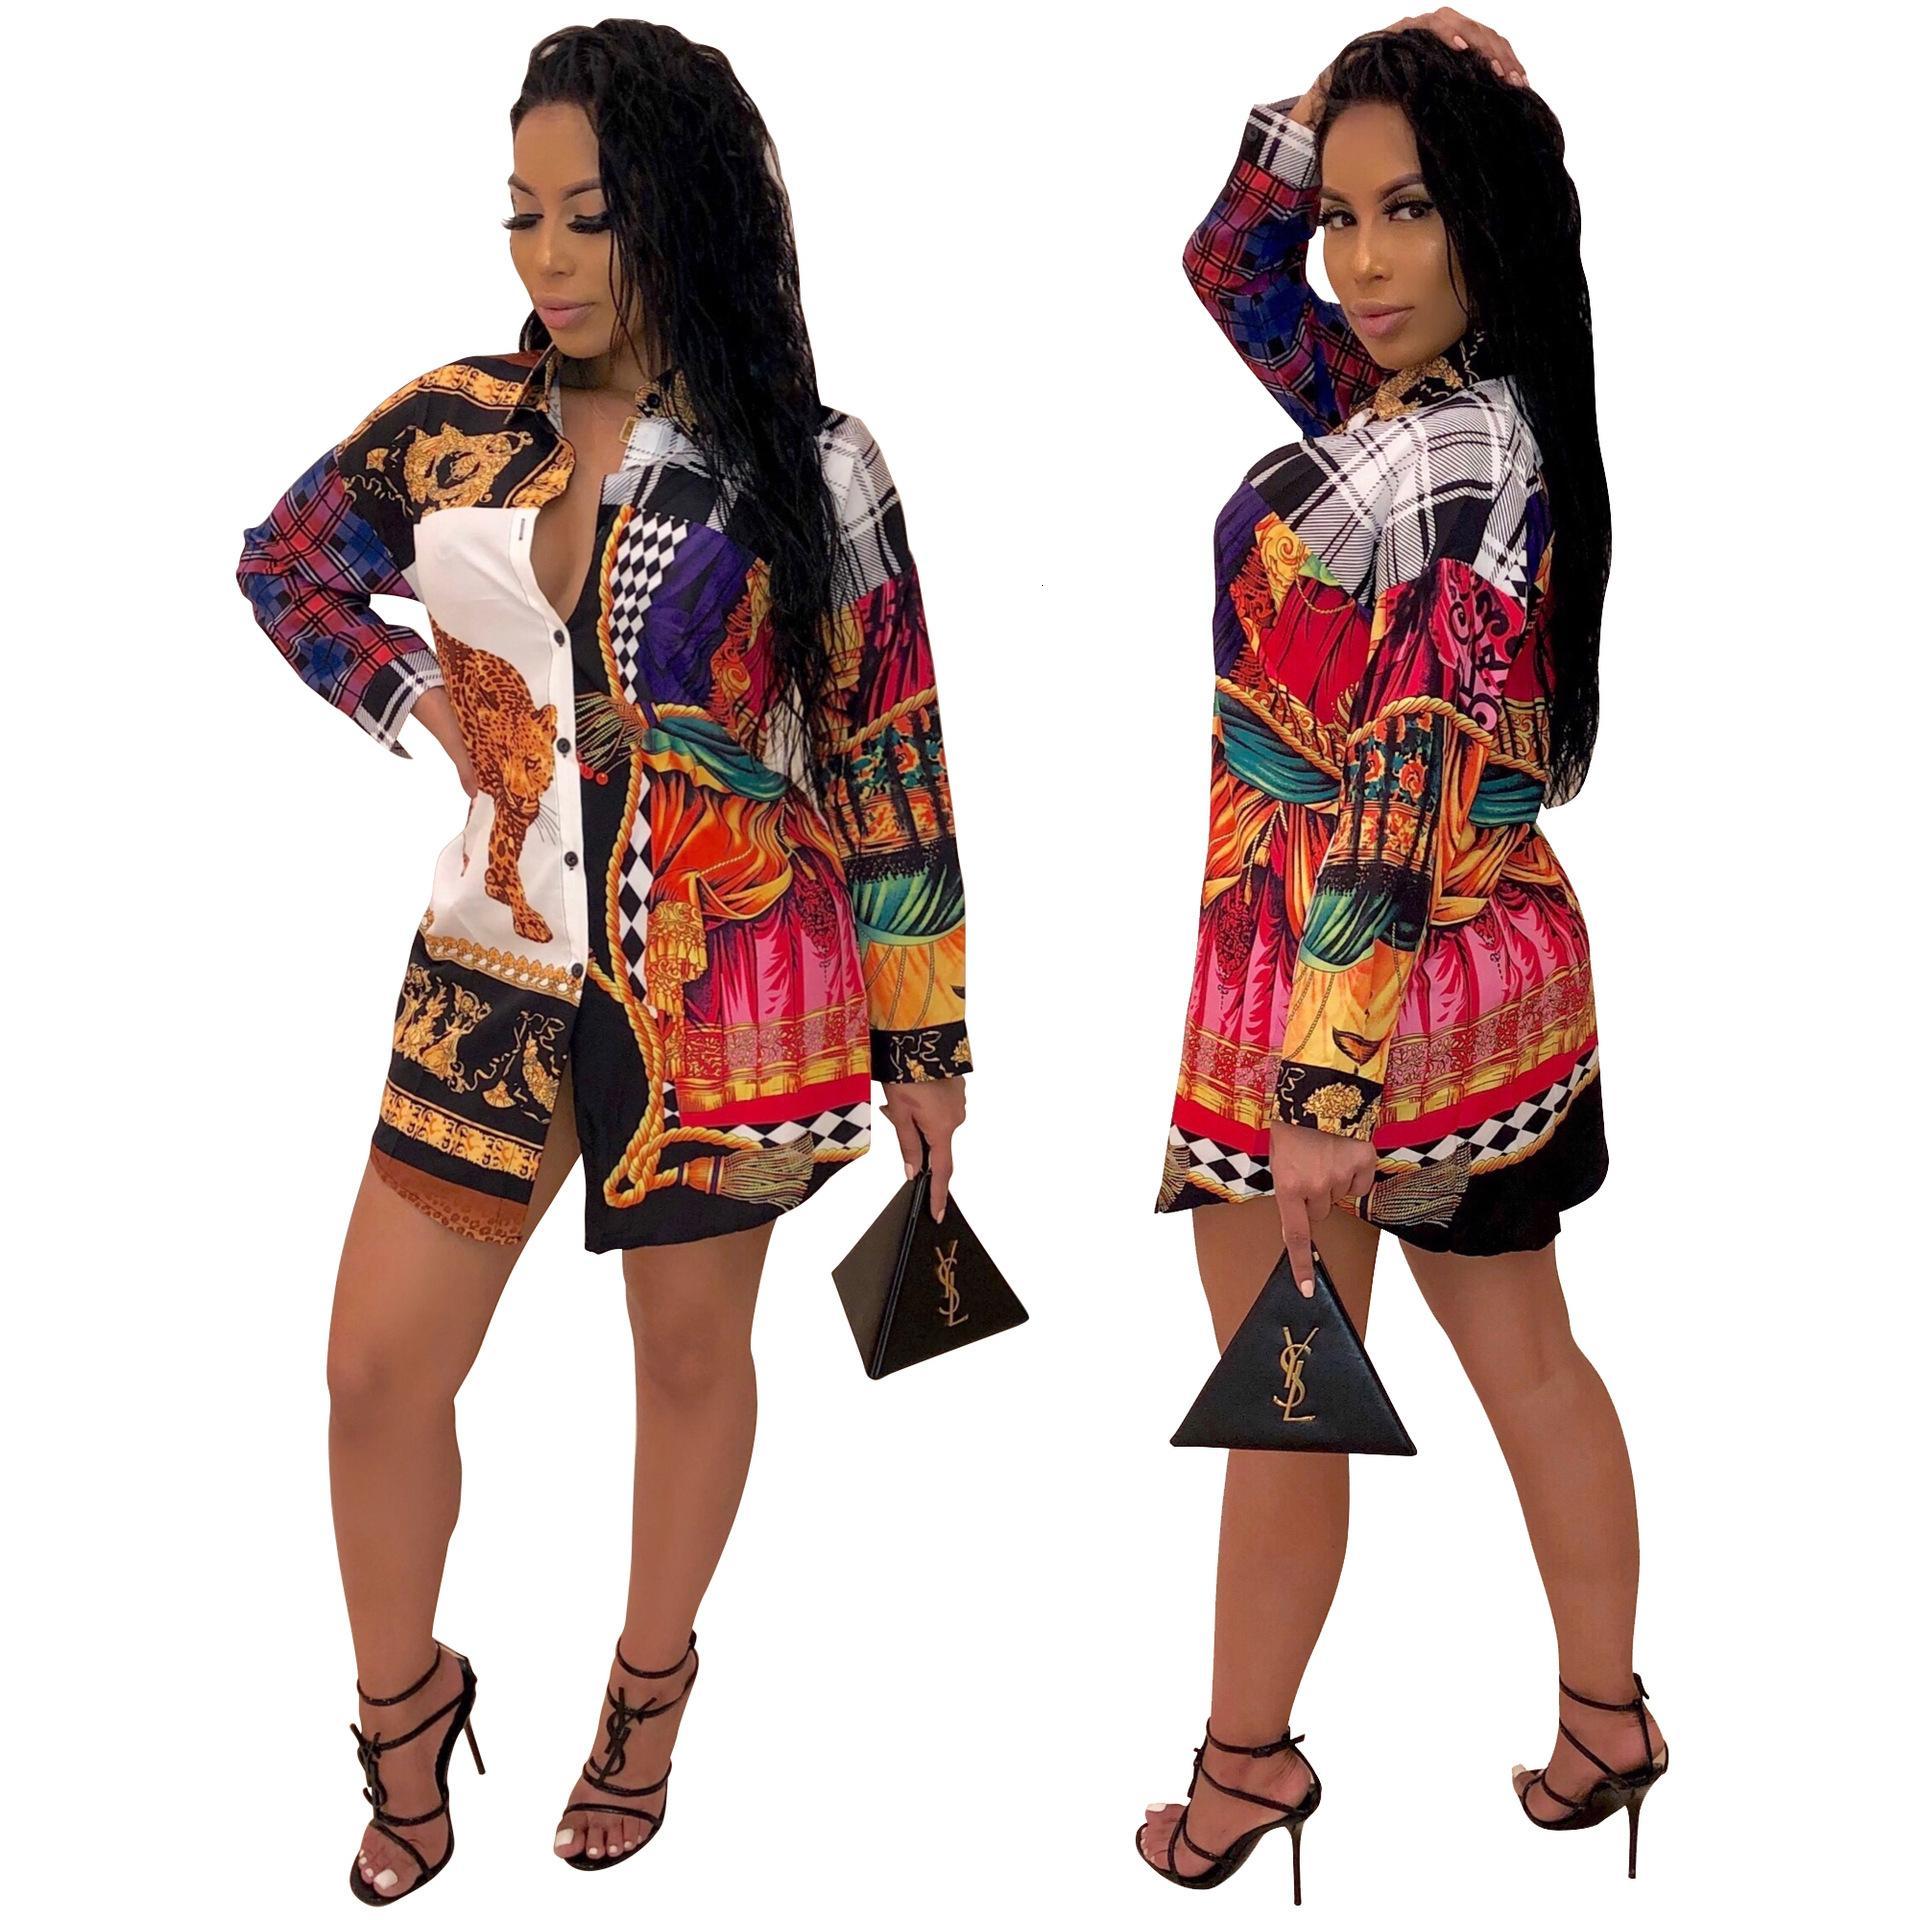 Camisa Smr9356 Plataforma Impresión Fiery policromática de ropa de las mujeres Skirt2011